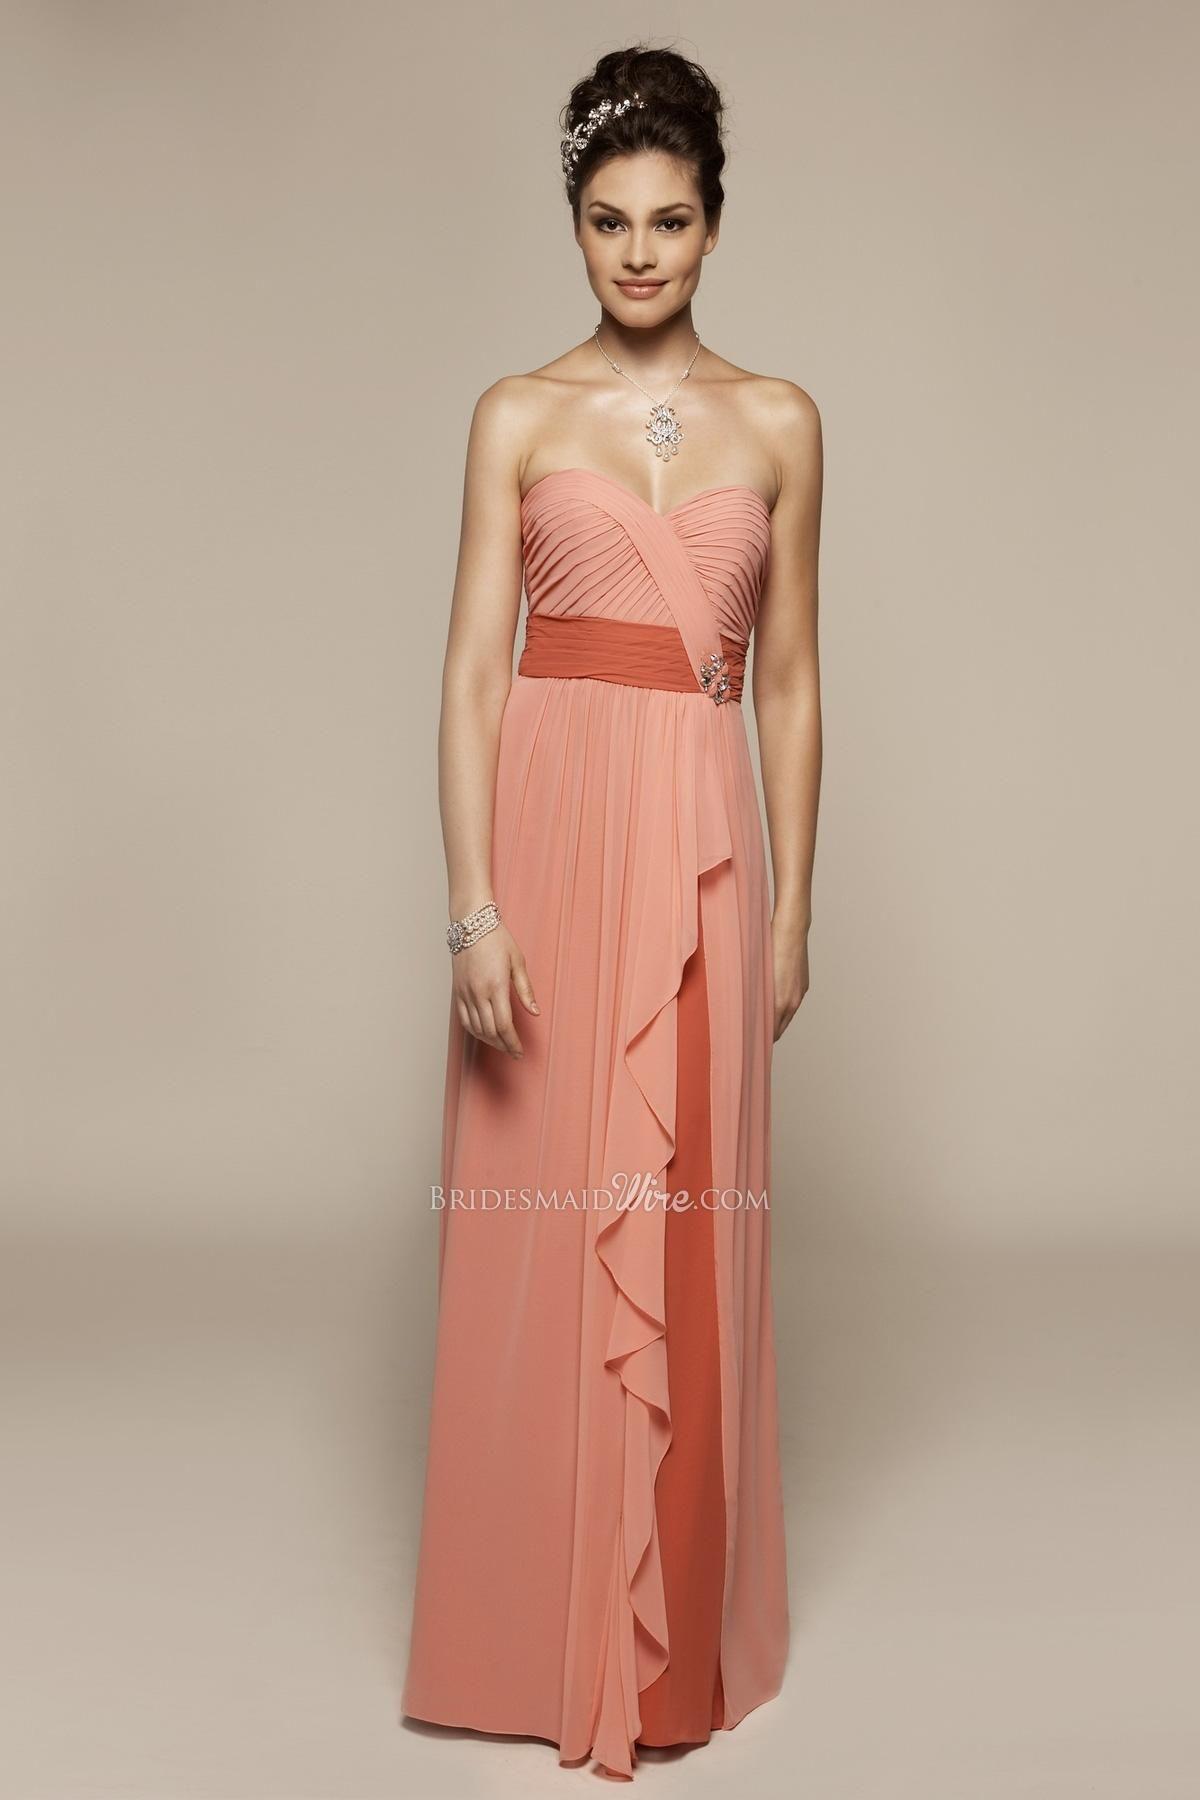 shirred bodice peach long #bridesmaid dress with cascading #skirt ...